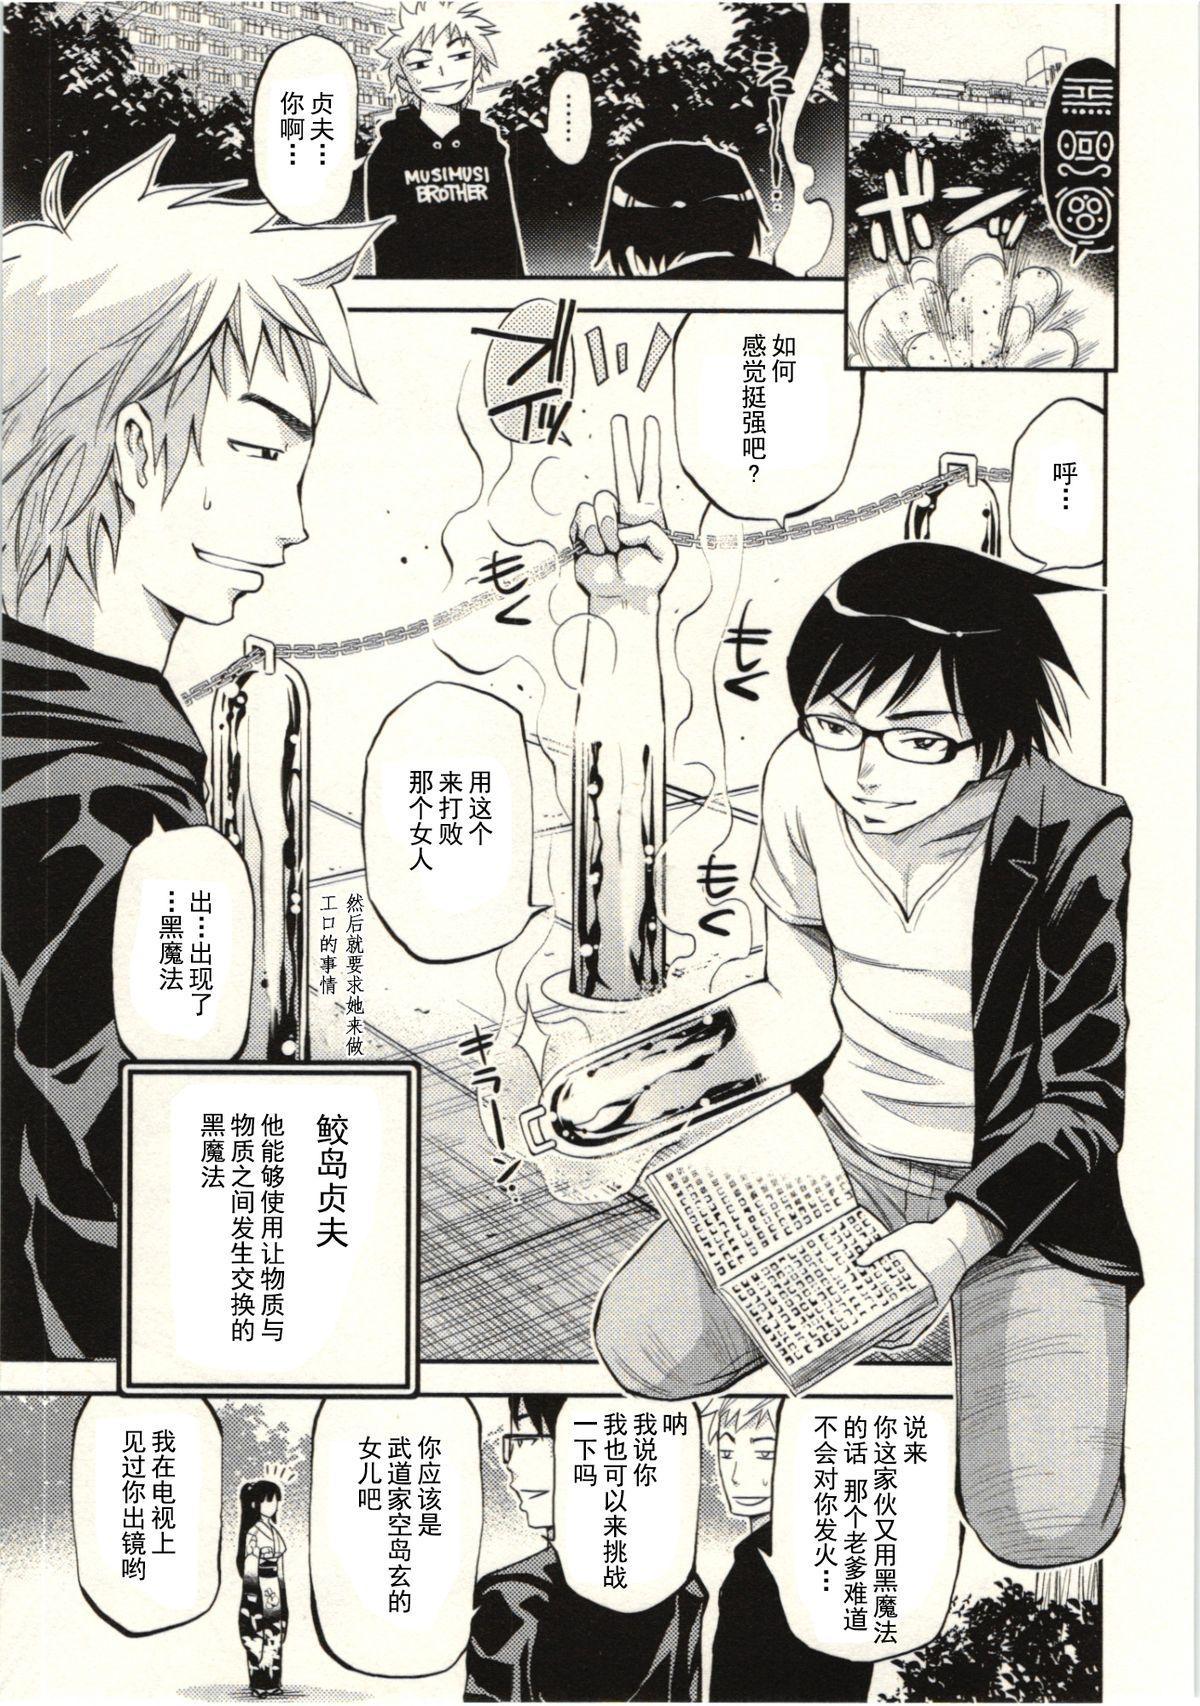 Tadashii Majutsu no Asobikata - The right way of playing of magic. 107